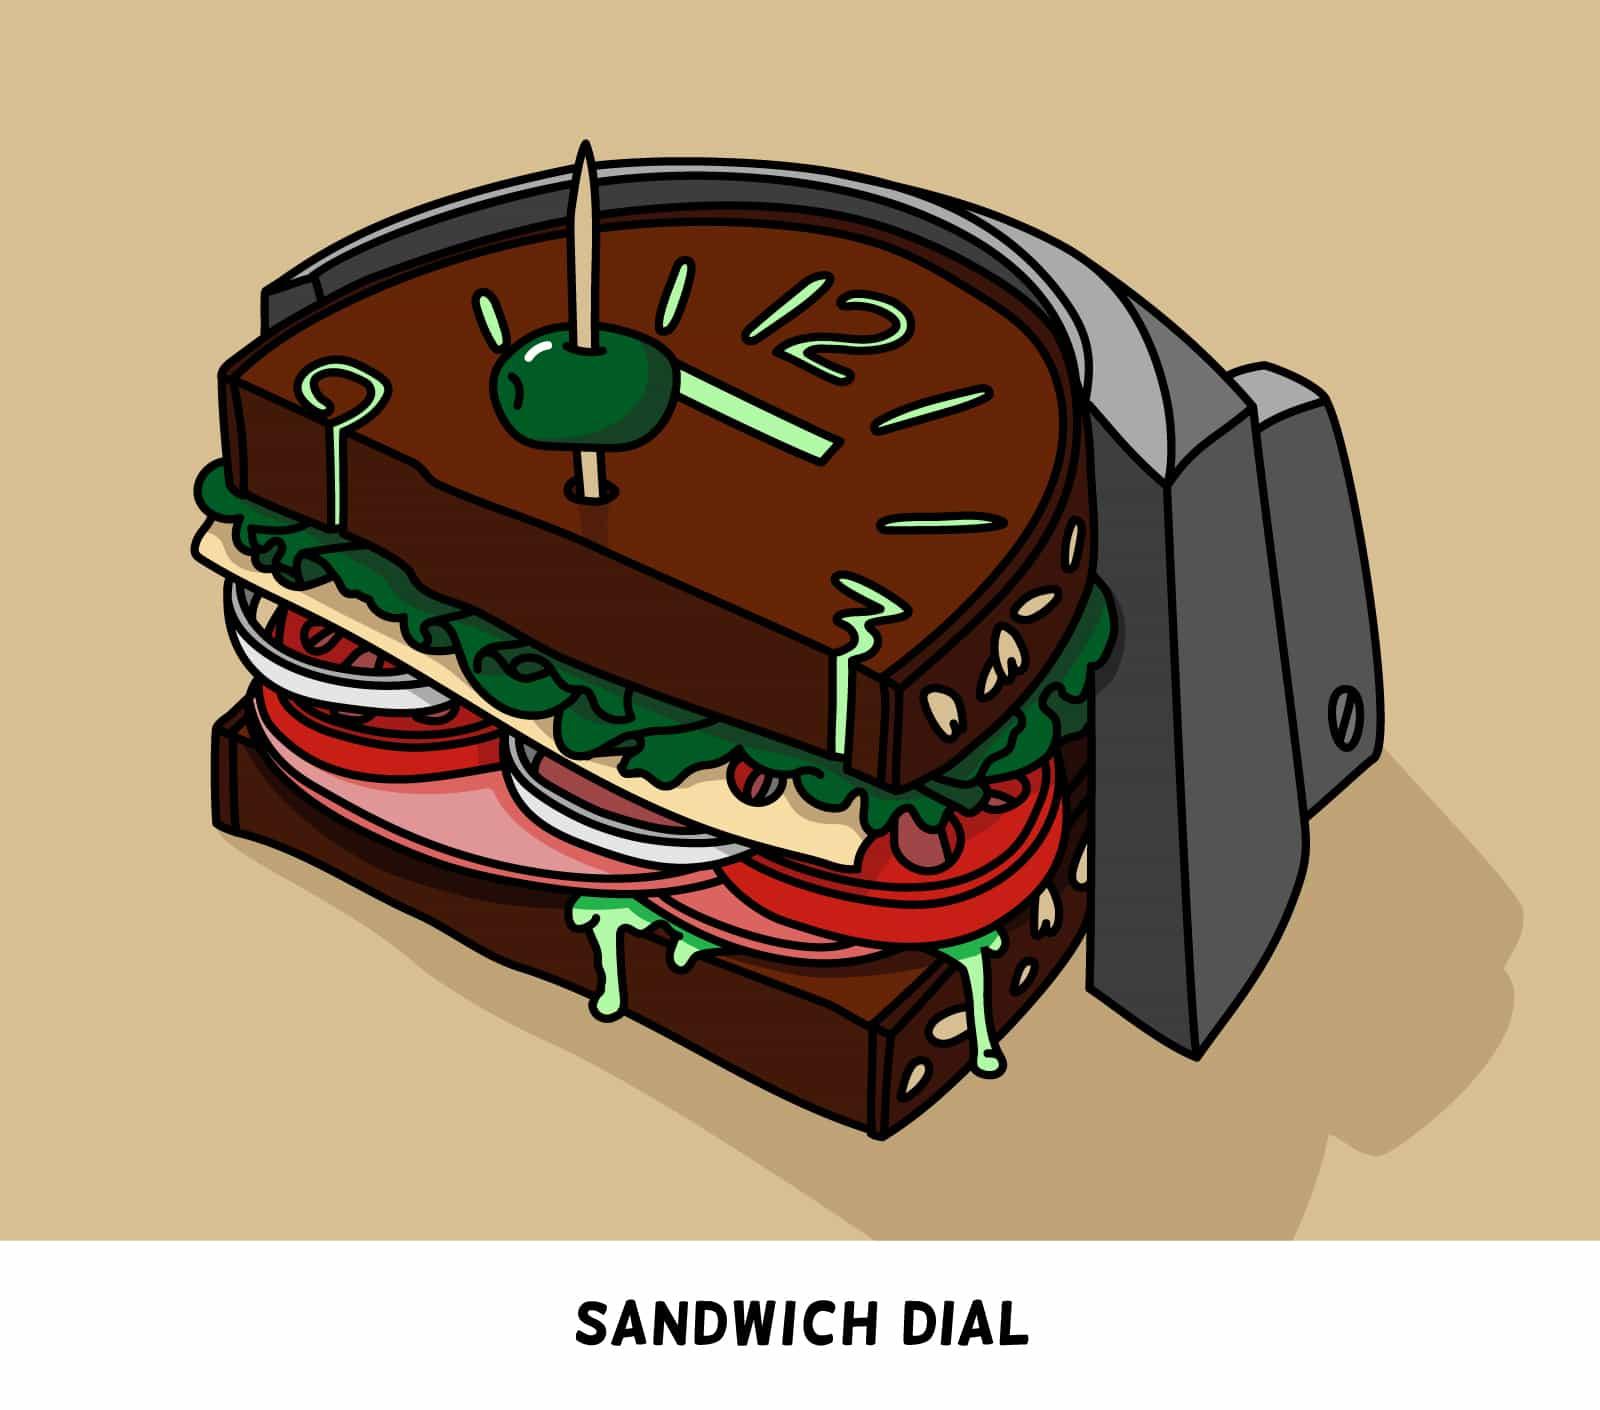 Sandwich dial